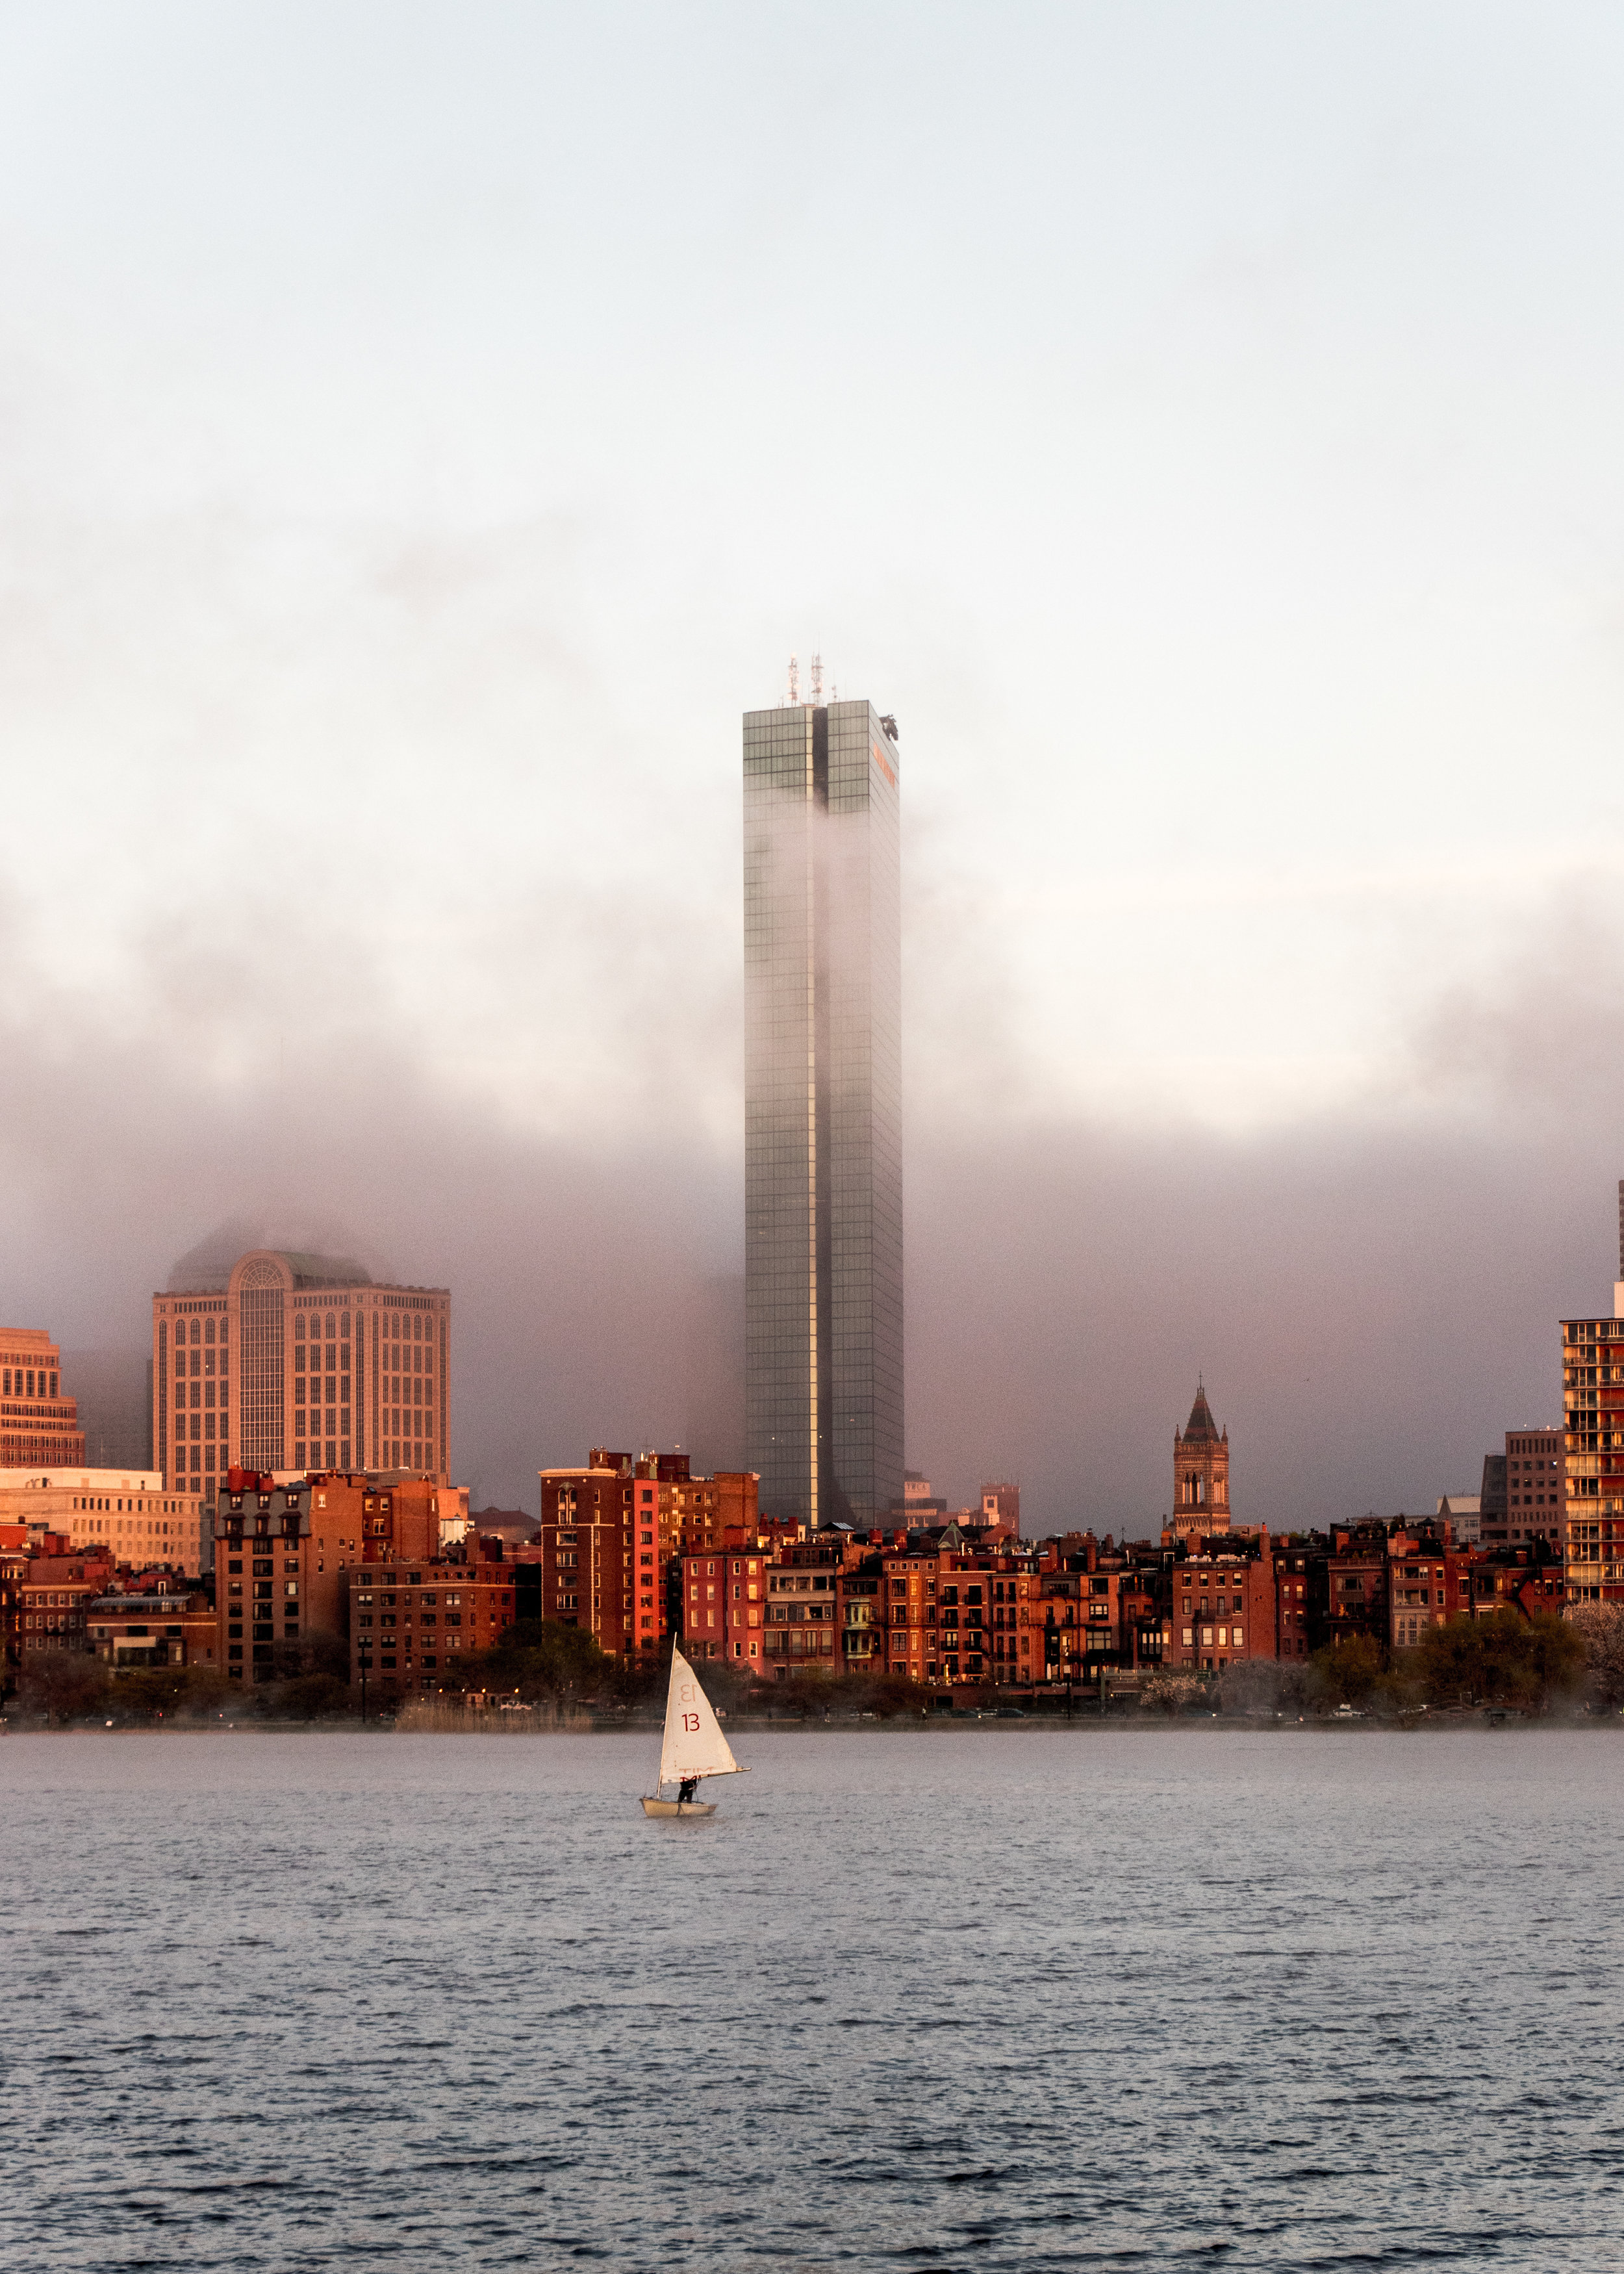 @magmattiooo - Charles River, Boston, MA